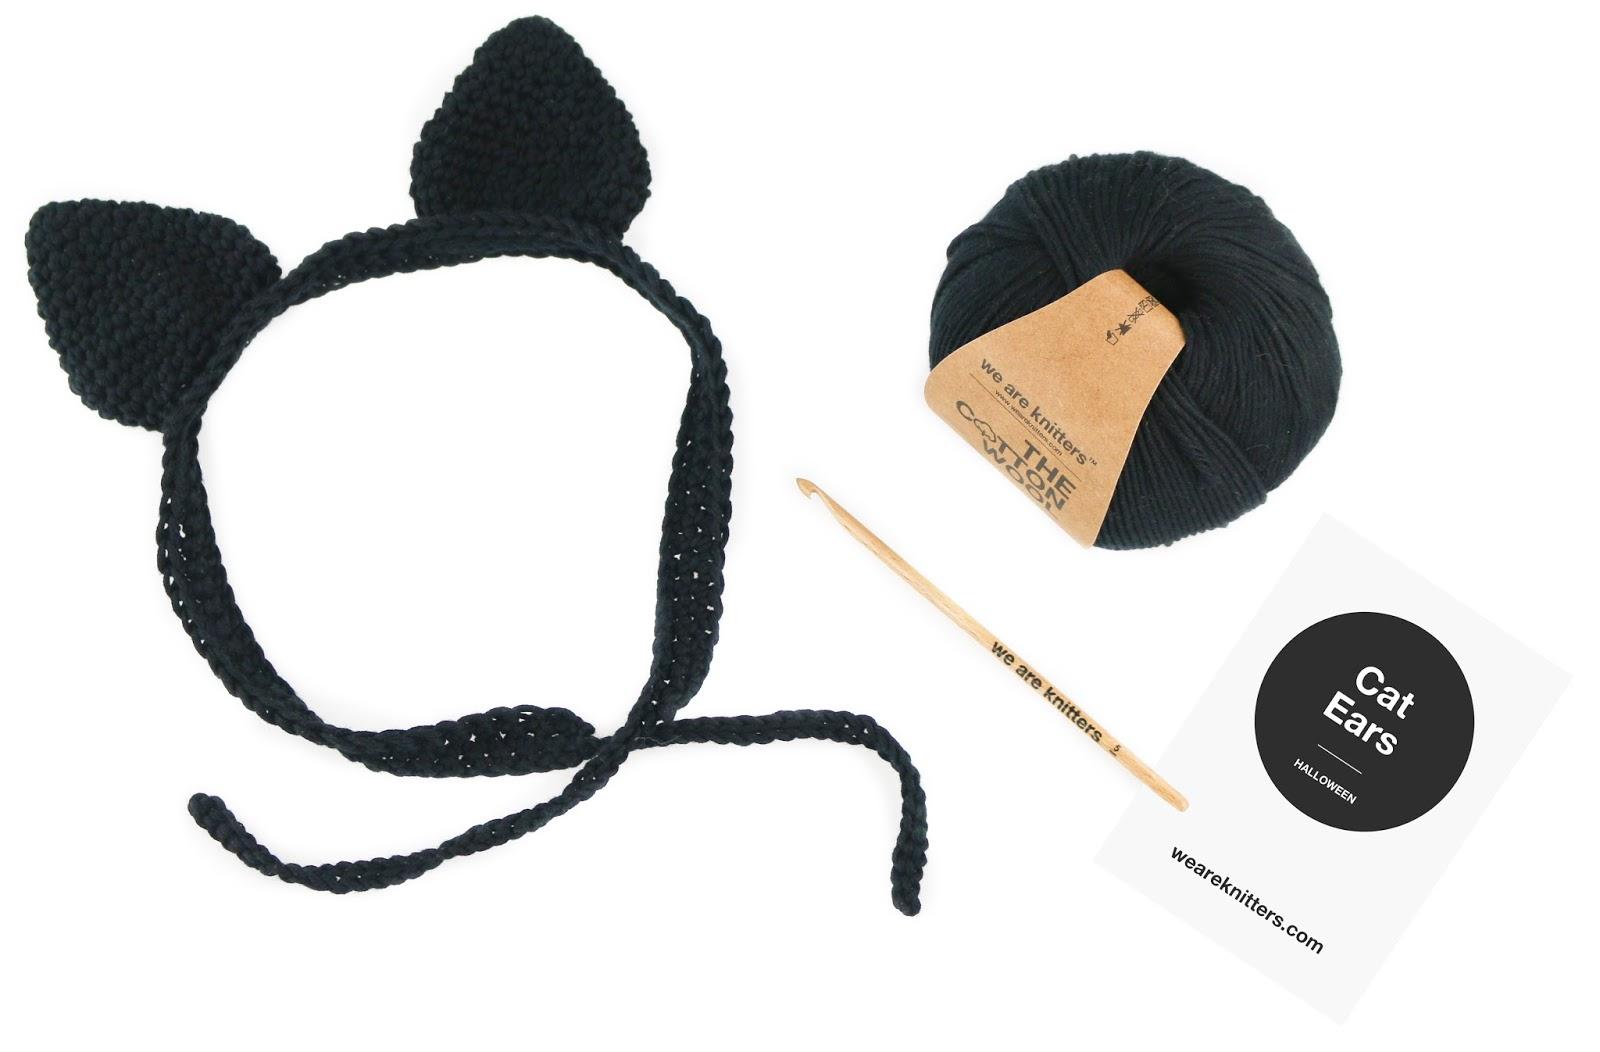 Atractivo Patrón De Crochet De Halloween Inspiración - Manta de ...